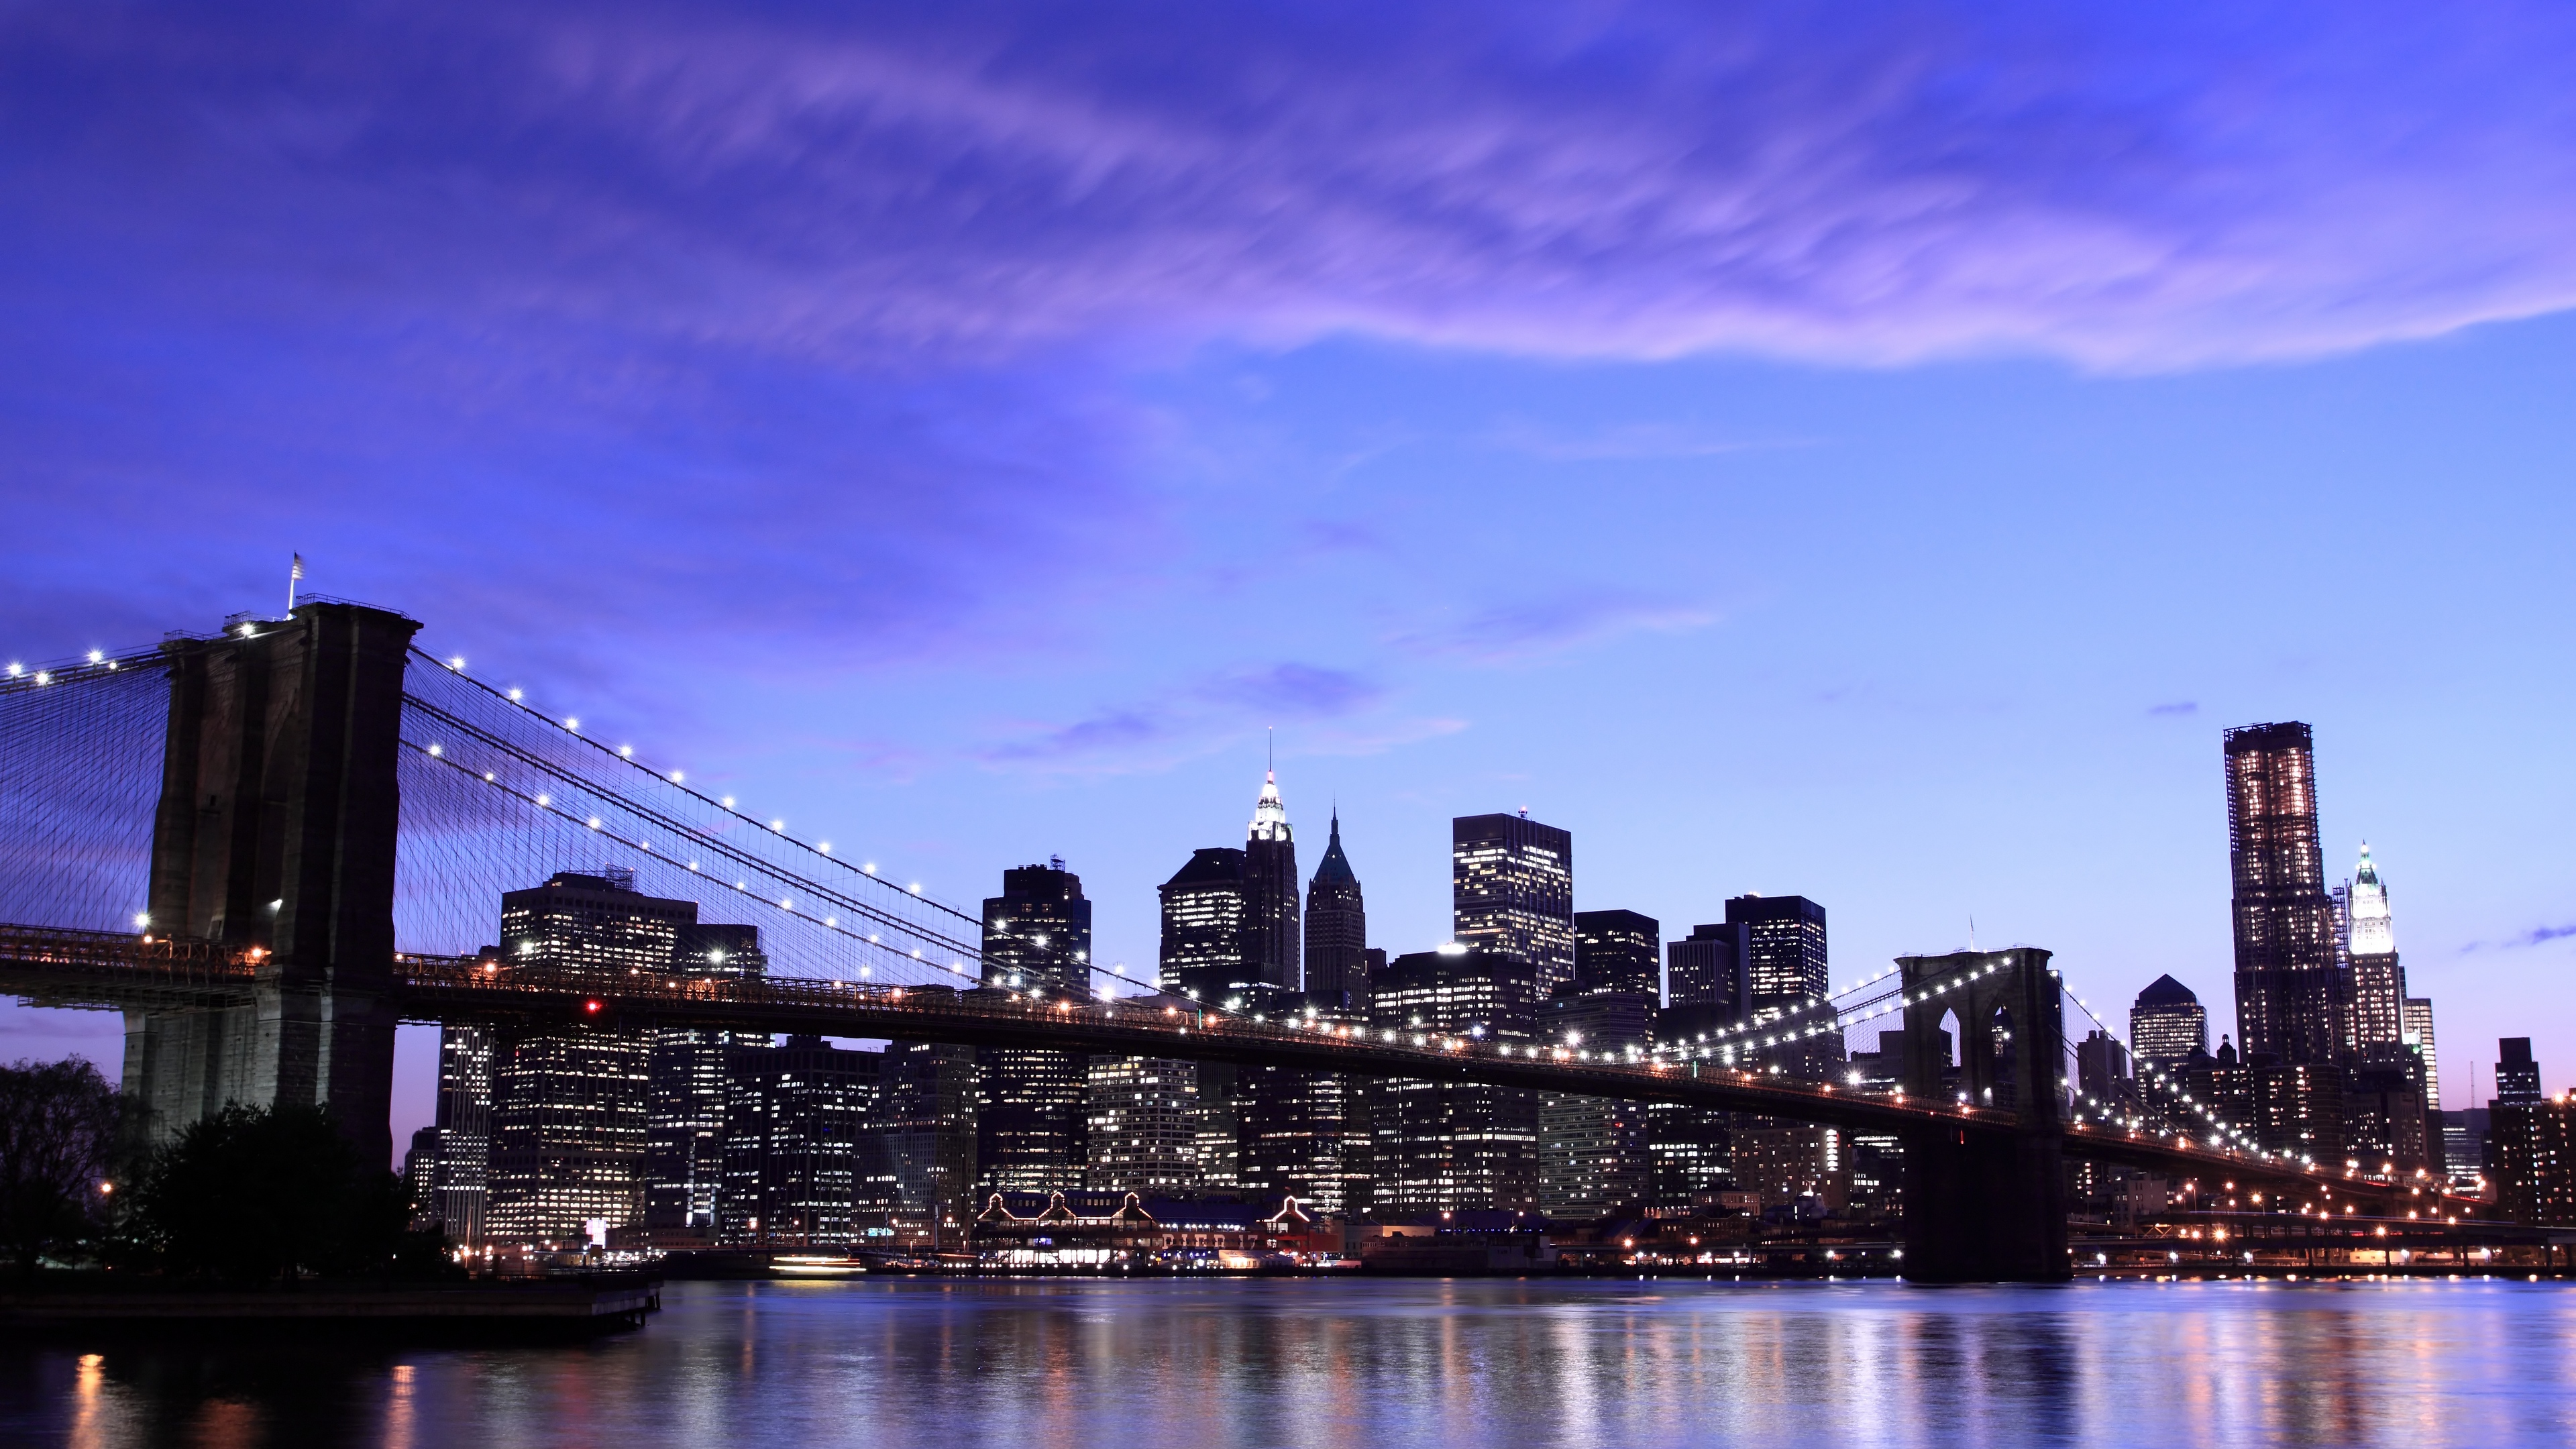 new york city brooklyn bridge evening lights sky clouds 4k 1538066367 - new york city, brooklyn bridge, evening, lights, sky, clouds 4k - new york city, Evening, brooklyn bridge